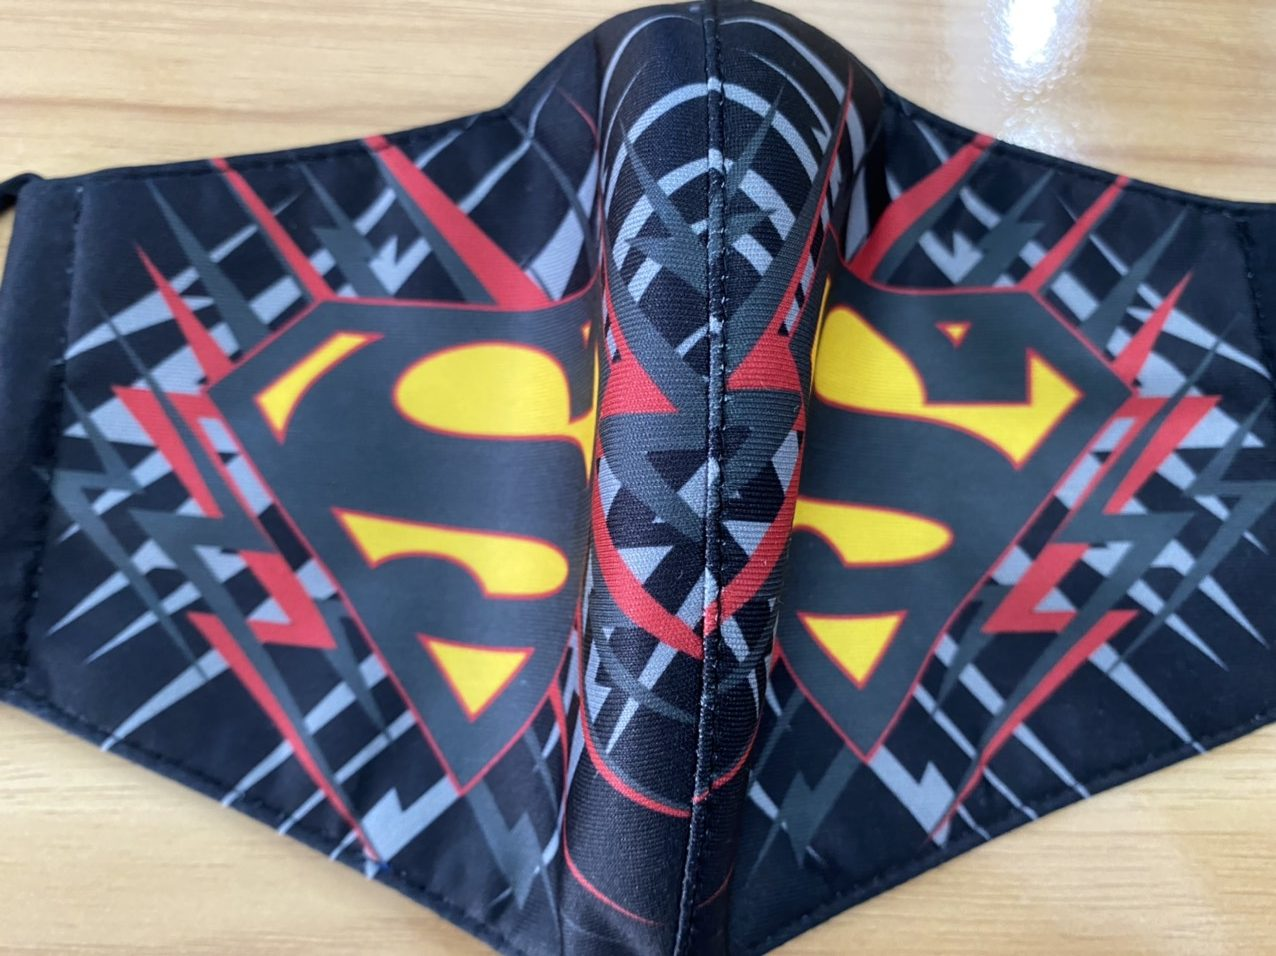 Khẩu Trang Vải In Logo SuperMan 2 Lớp - Mẫu Khẩu Trang In 3D Logo Super Man Nền Xanh 7